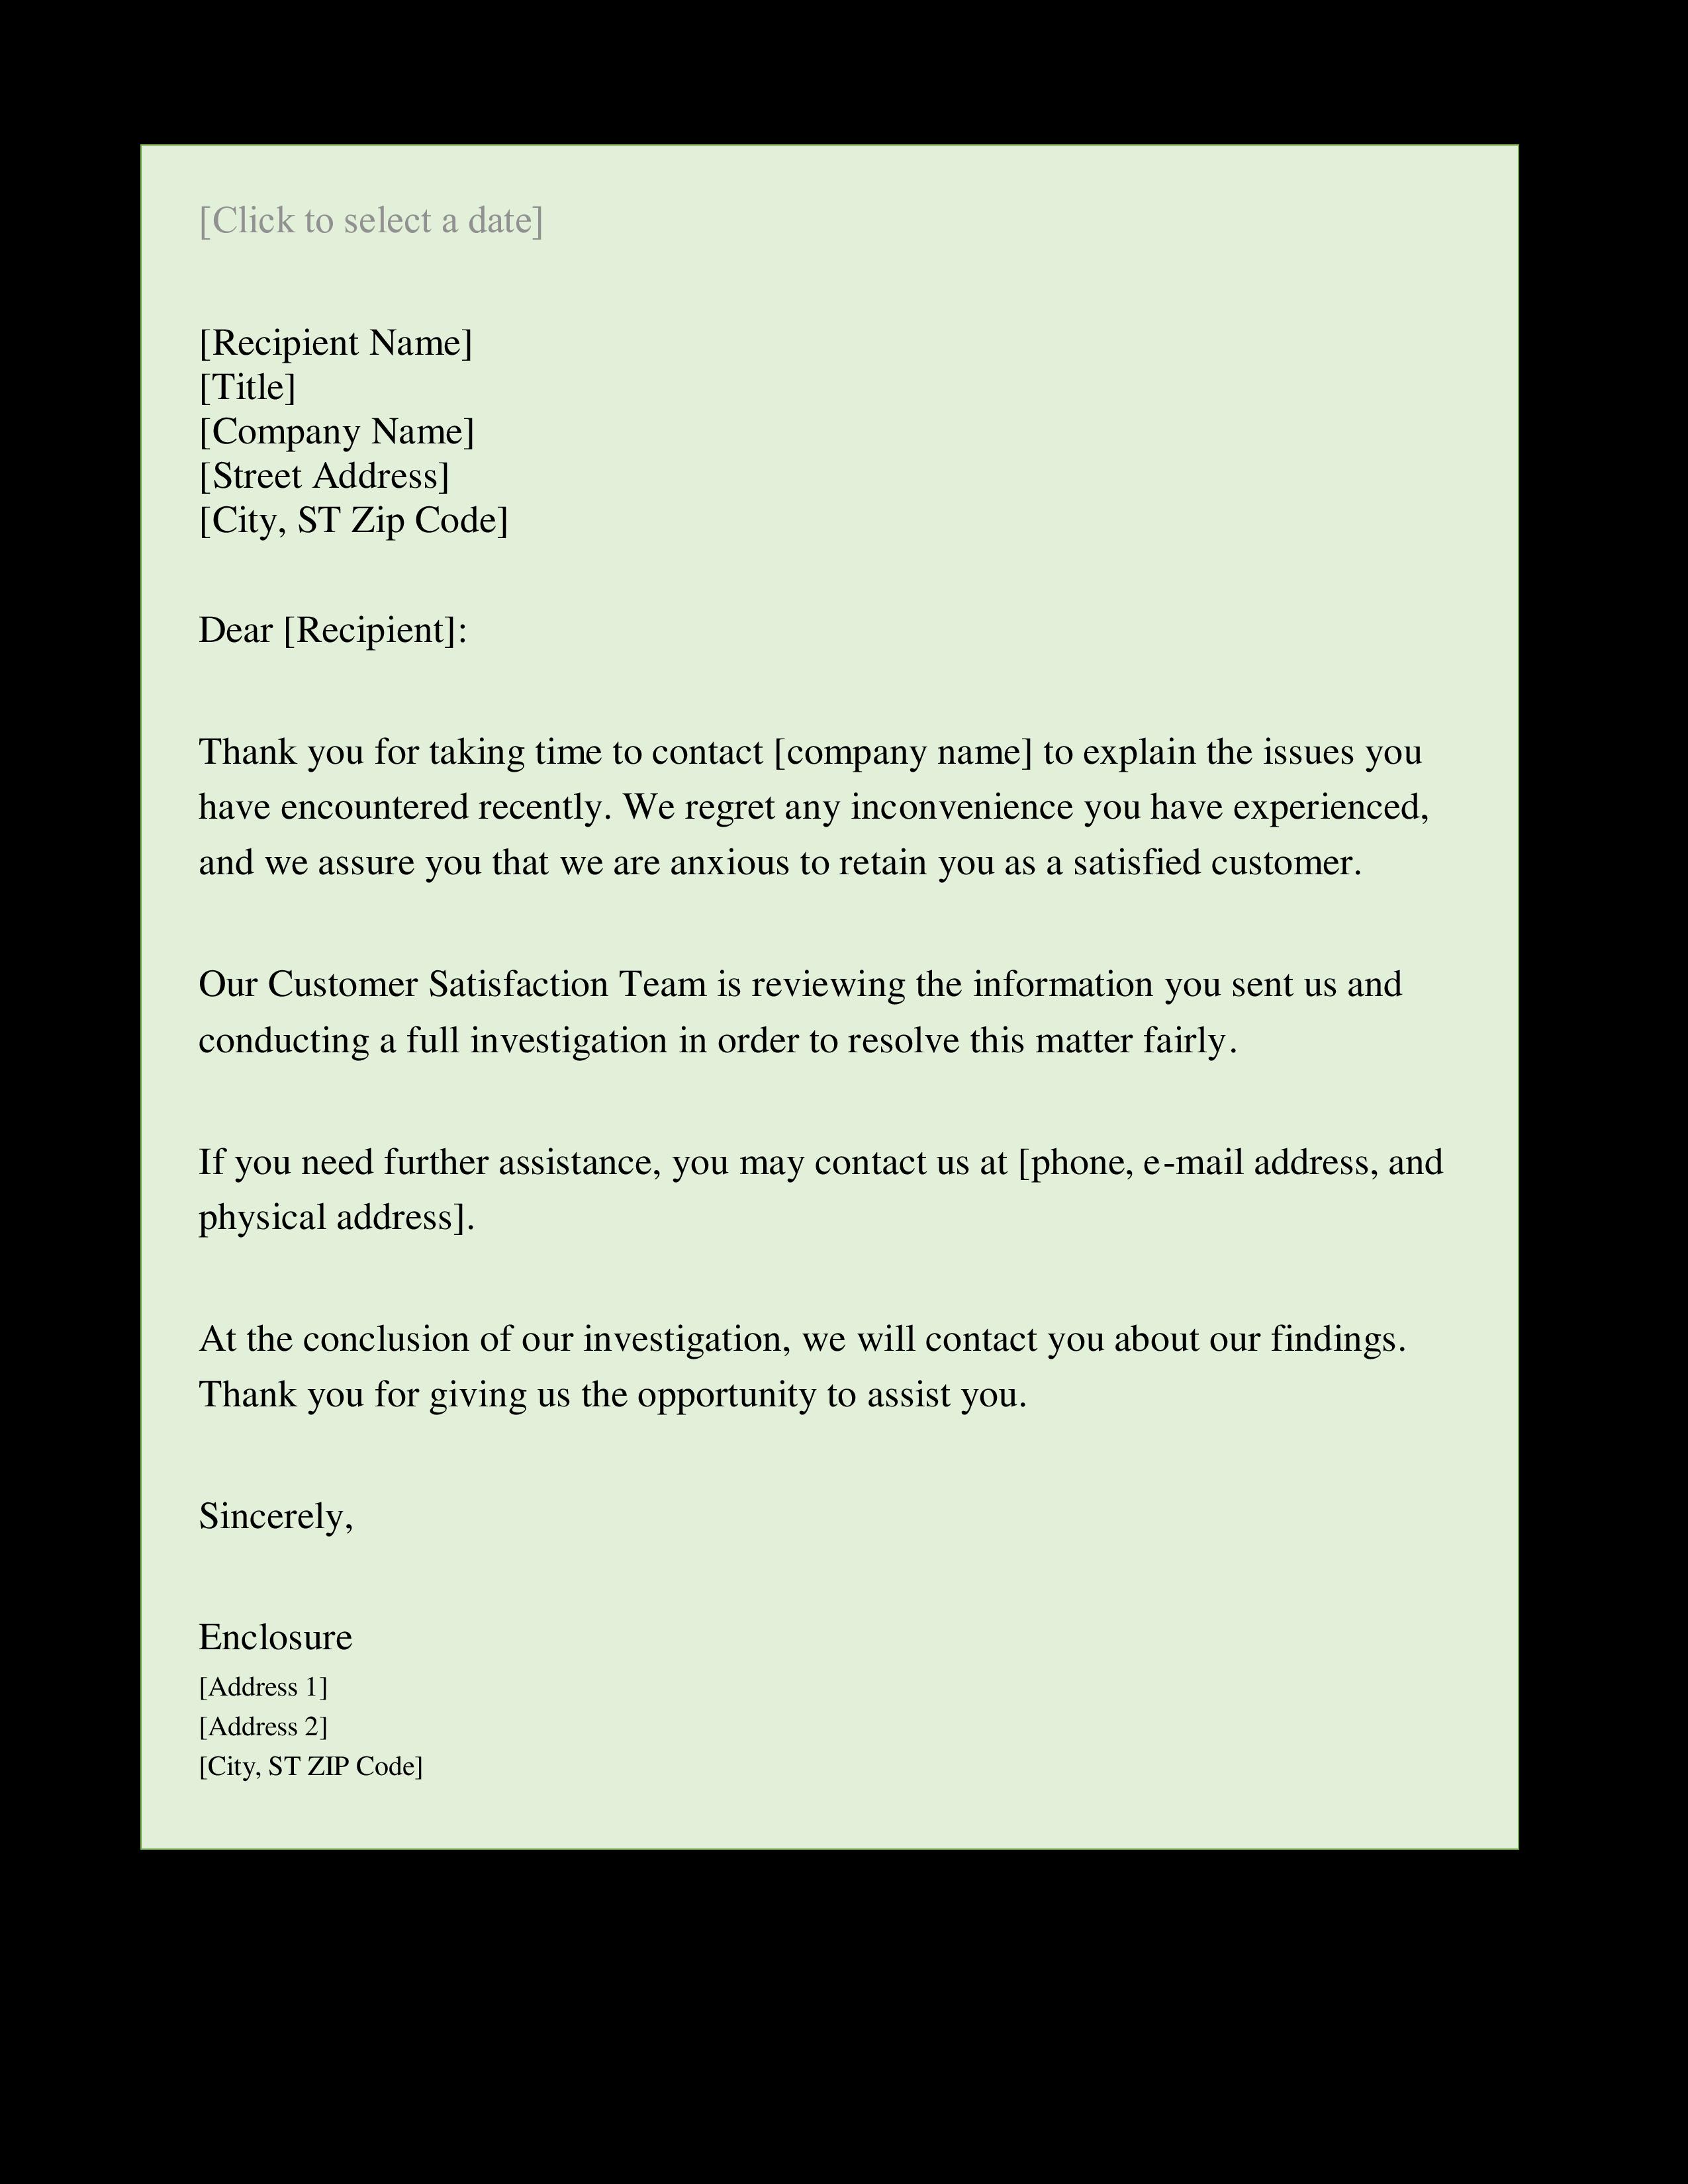 complaint response letter main image download template